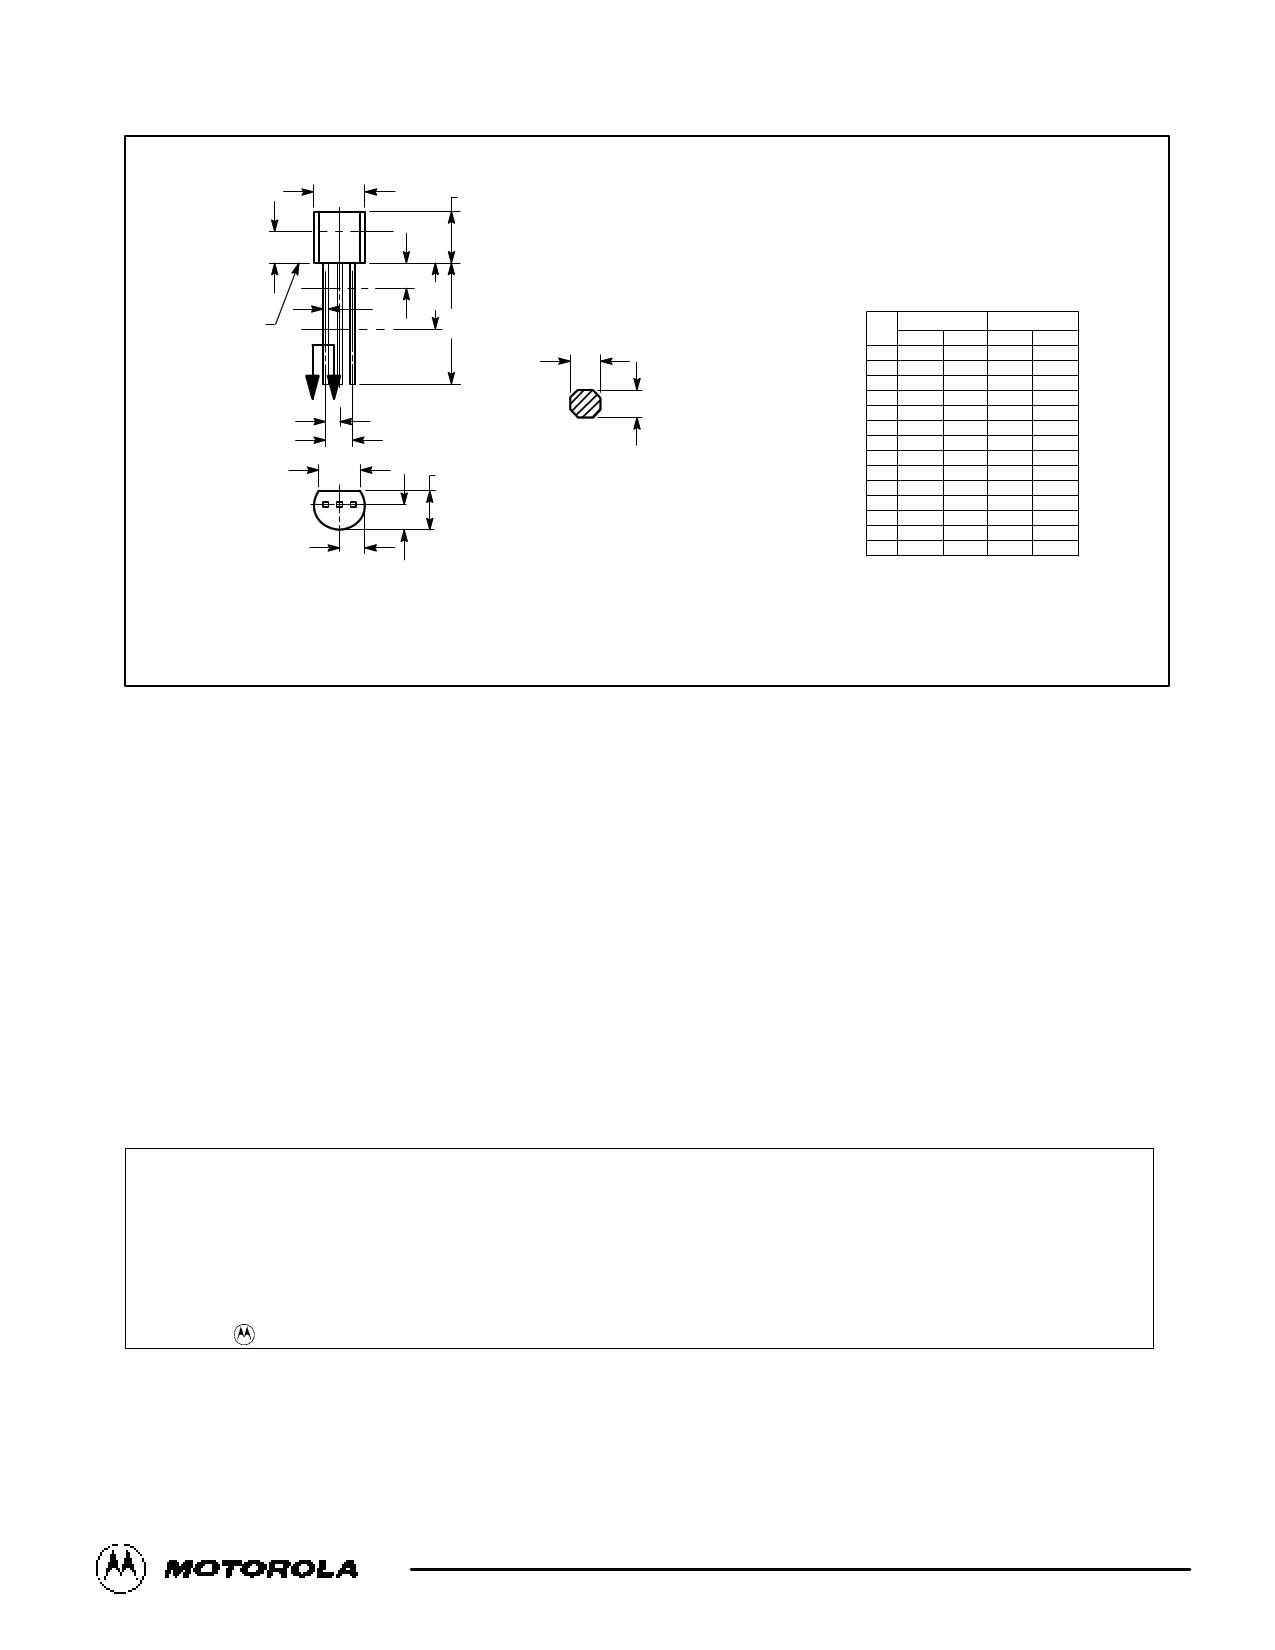 BC549B pdf, 반도체, 판매, 대치품